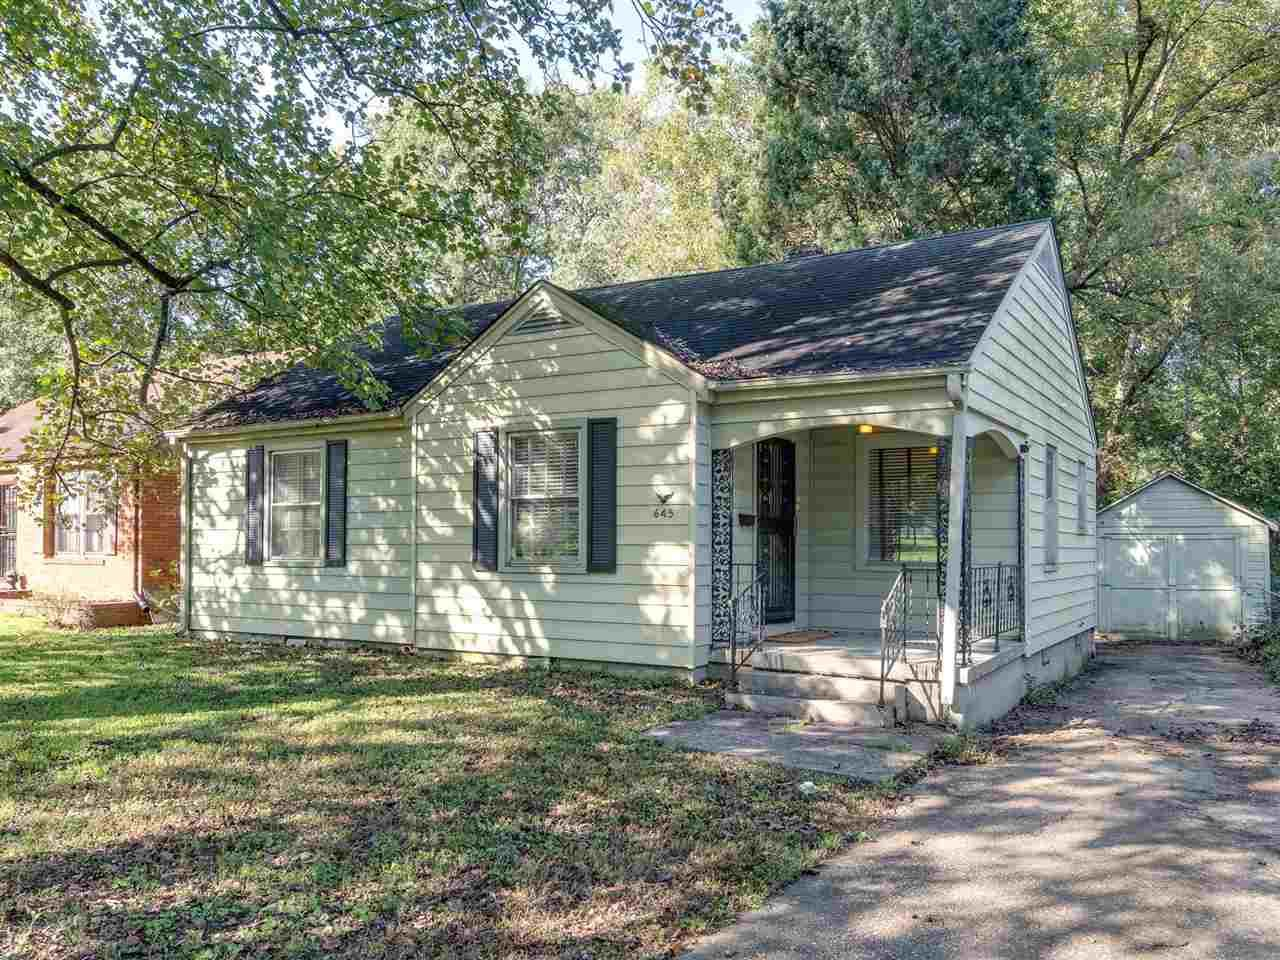 645 S GOODLETT RD, Memphis, TN 38111 - MLS#: 10110383